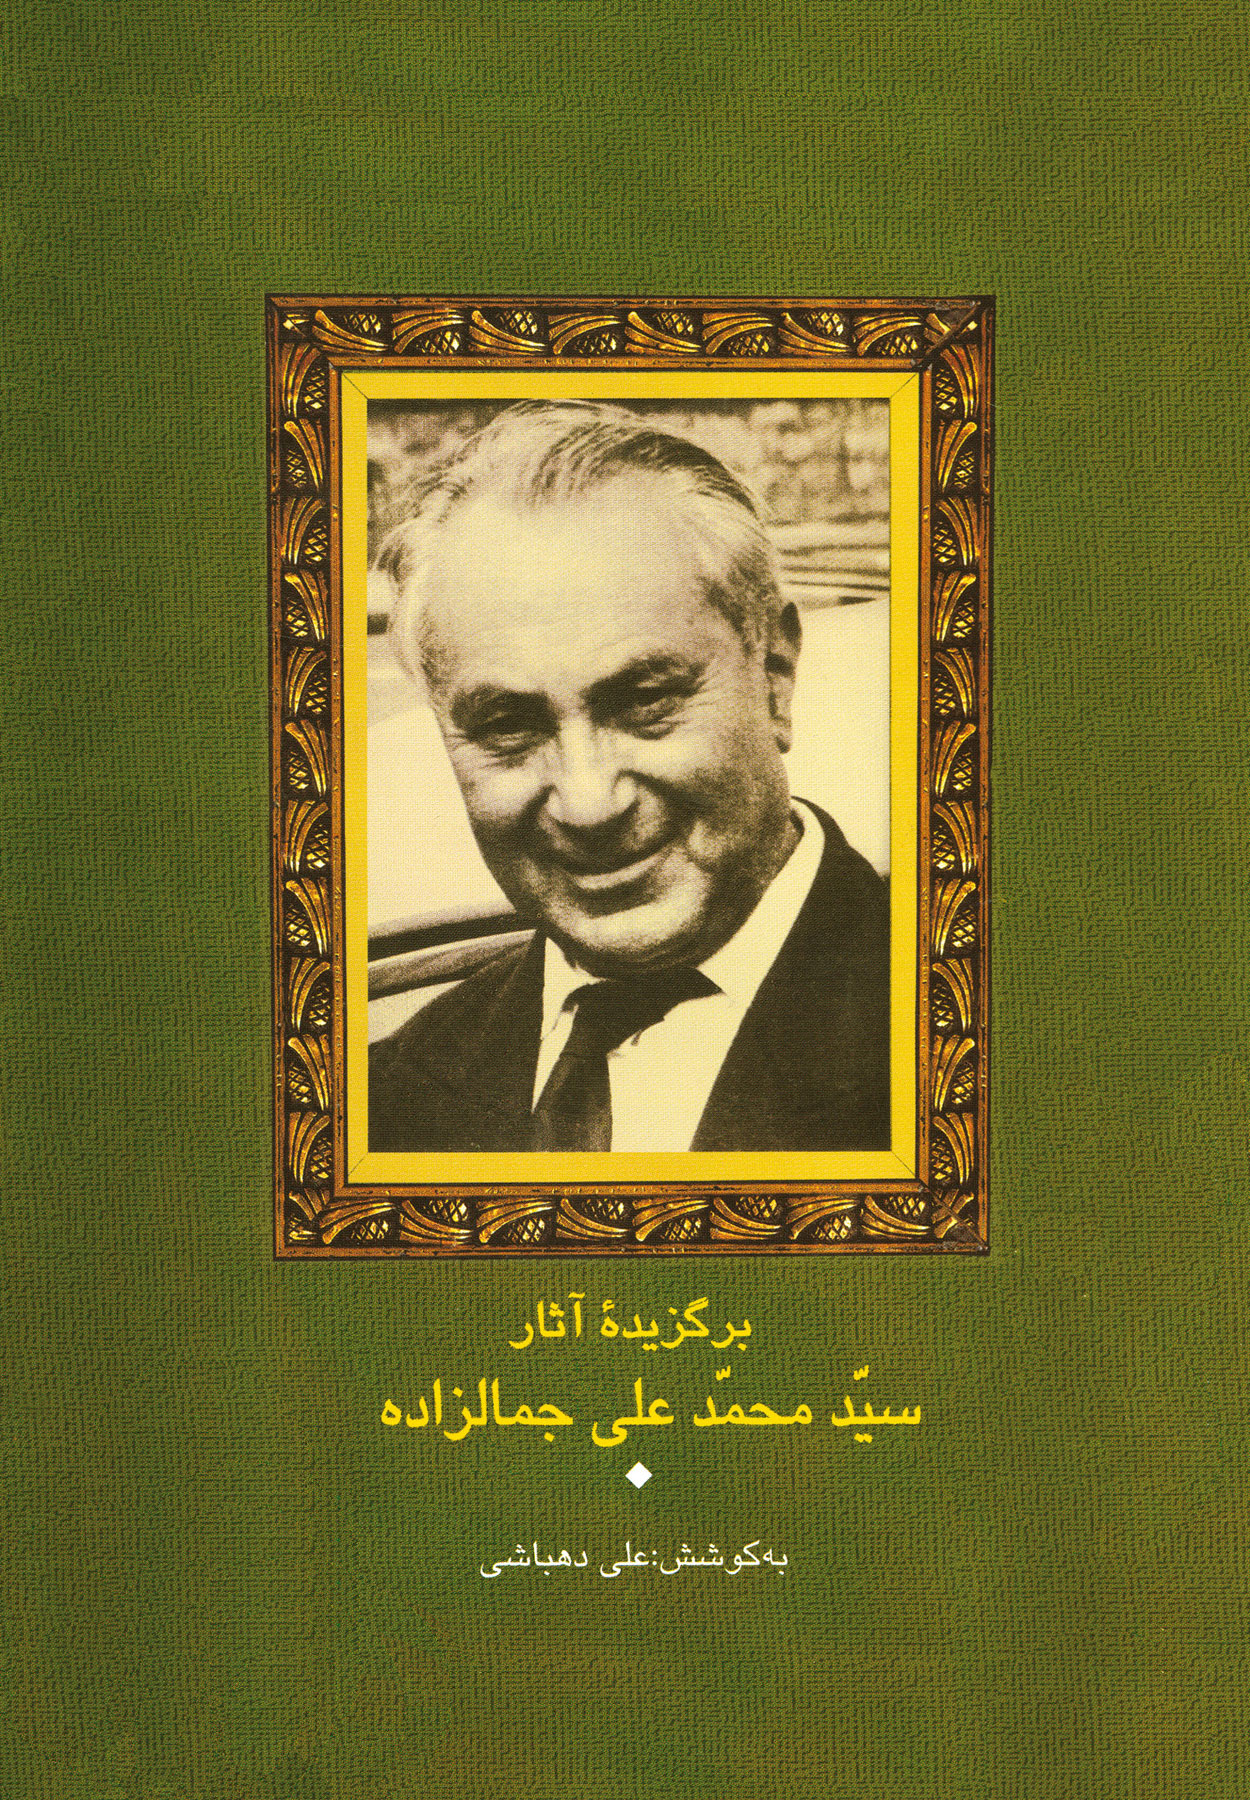 Jamalzadeh-(2)